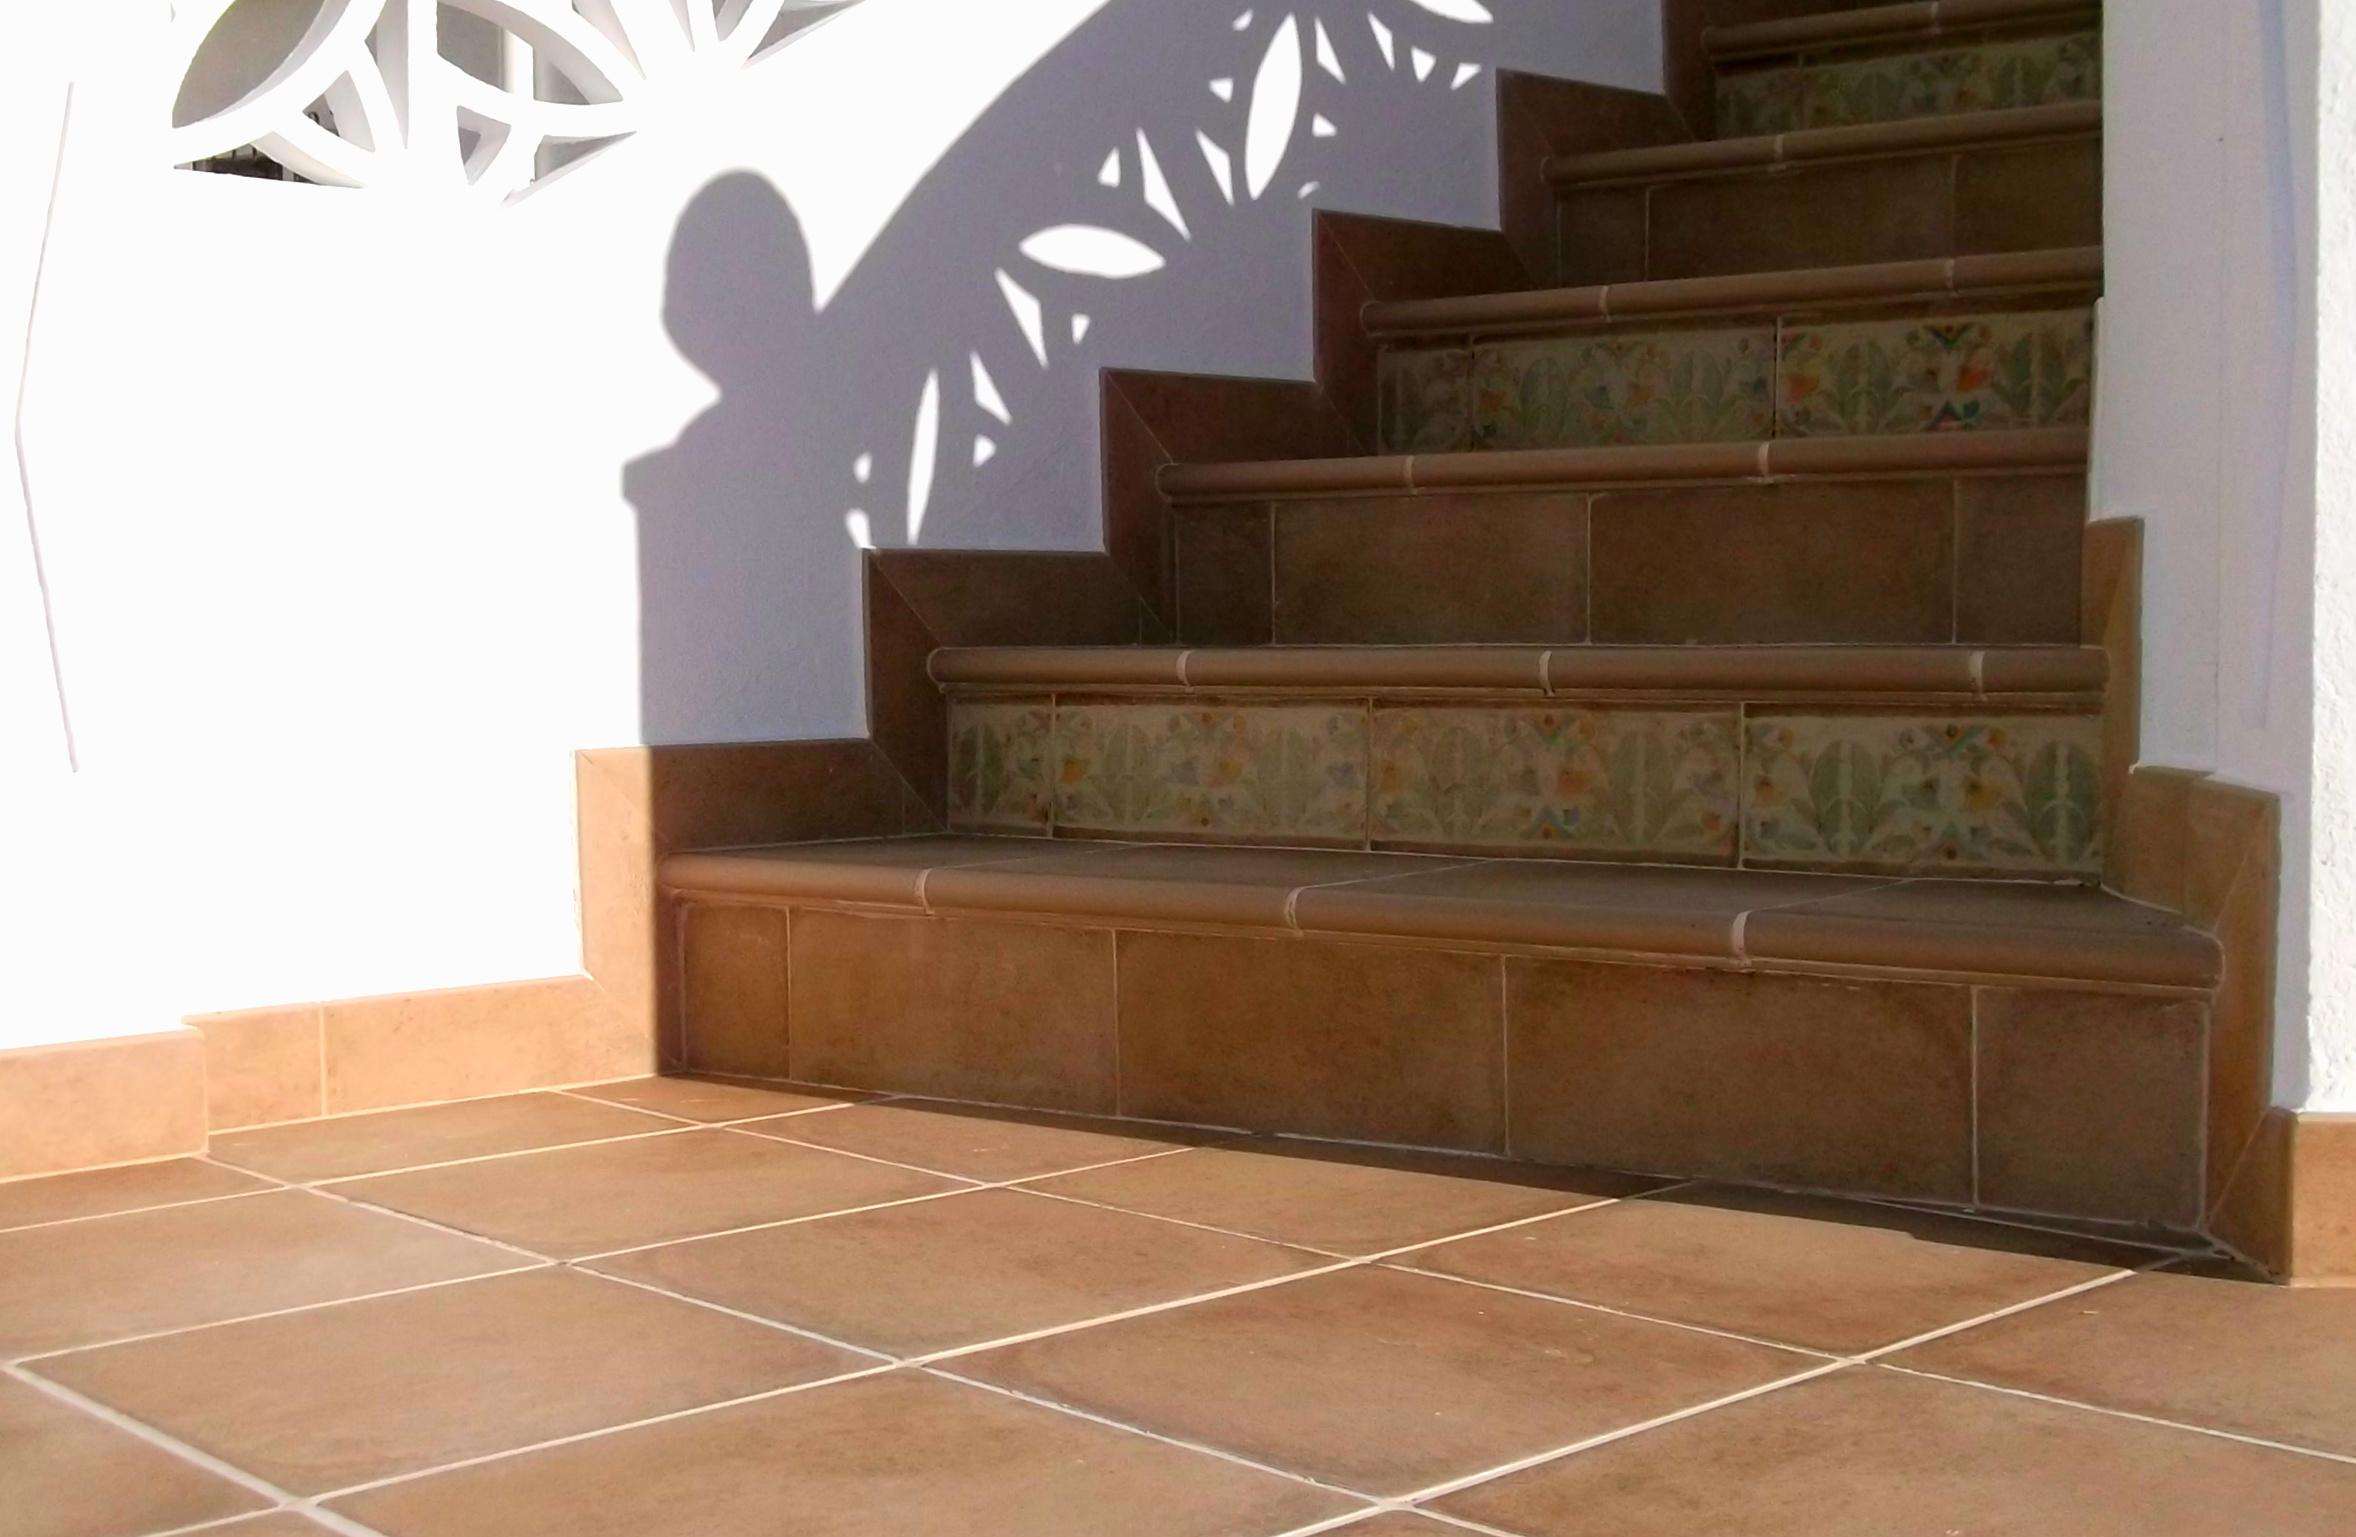 Fotos De Escaleras Rusticas Fabulous Cool Cabina Escalera With - Escaleras-rusticas-de-interior